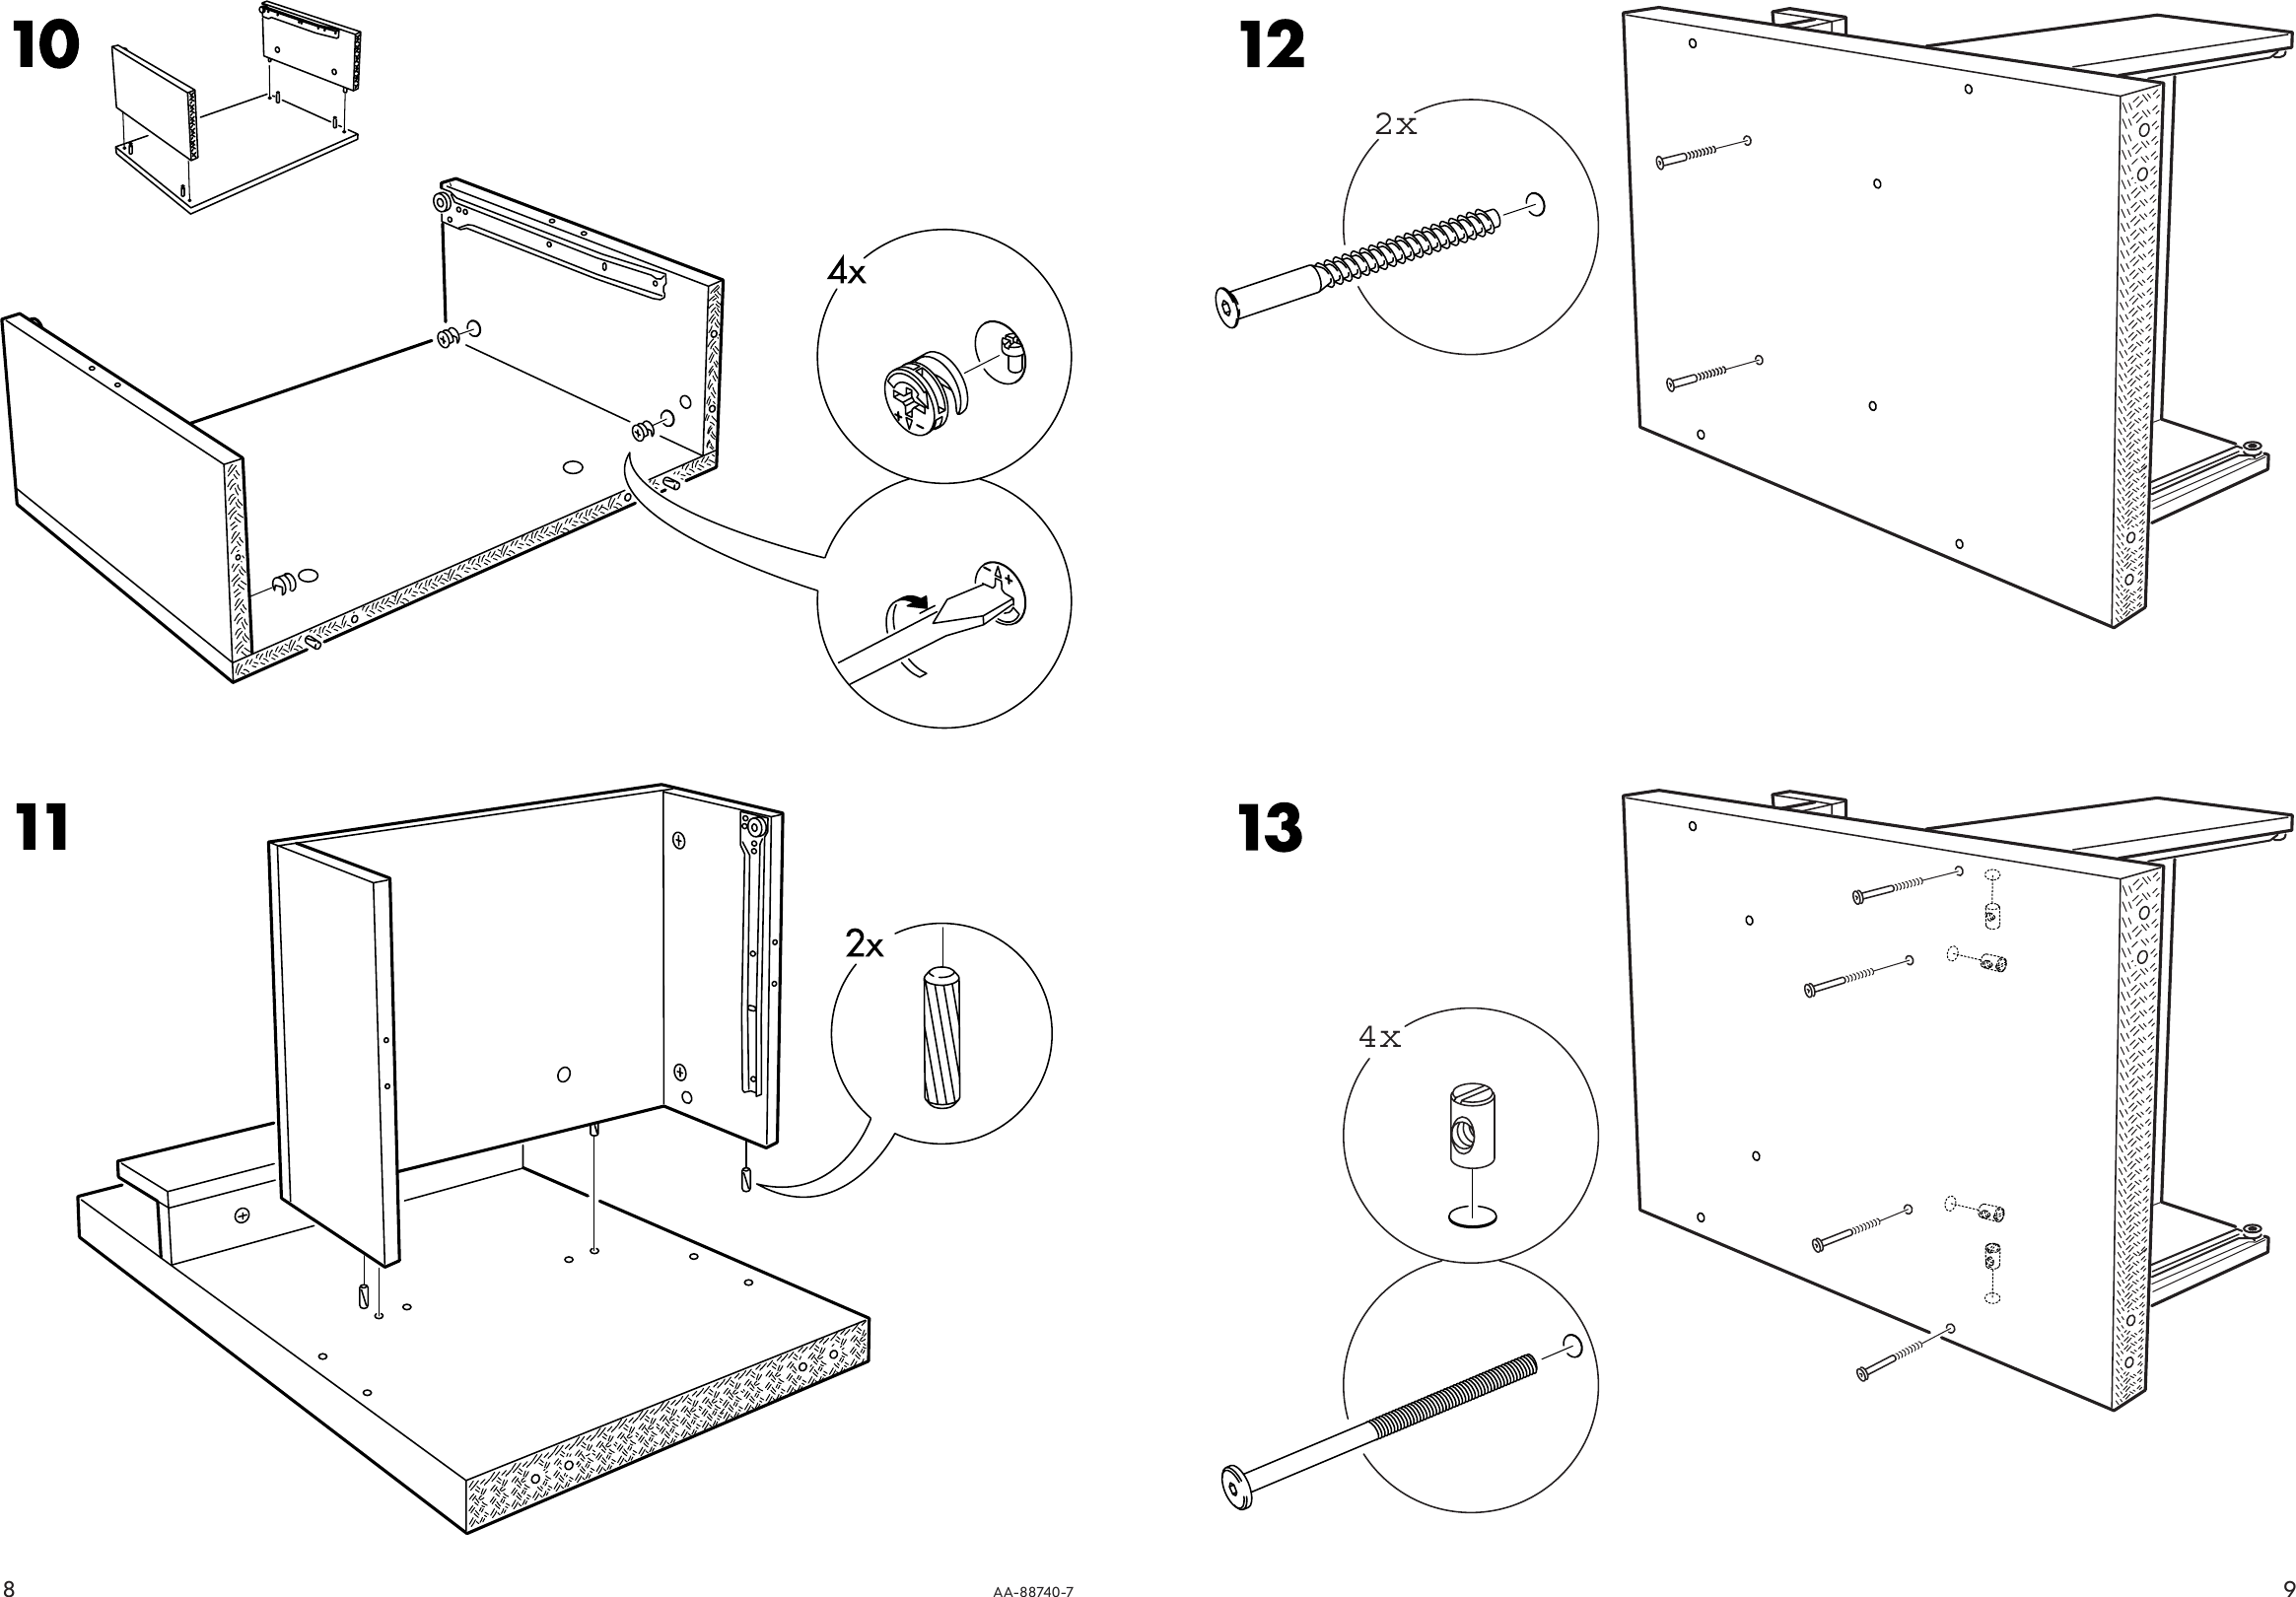 Ikea Malm Bedside Table 20x16 Assembly Instruction